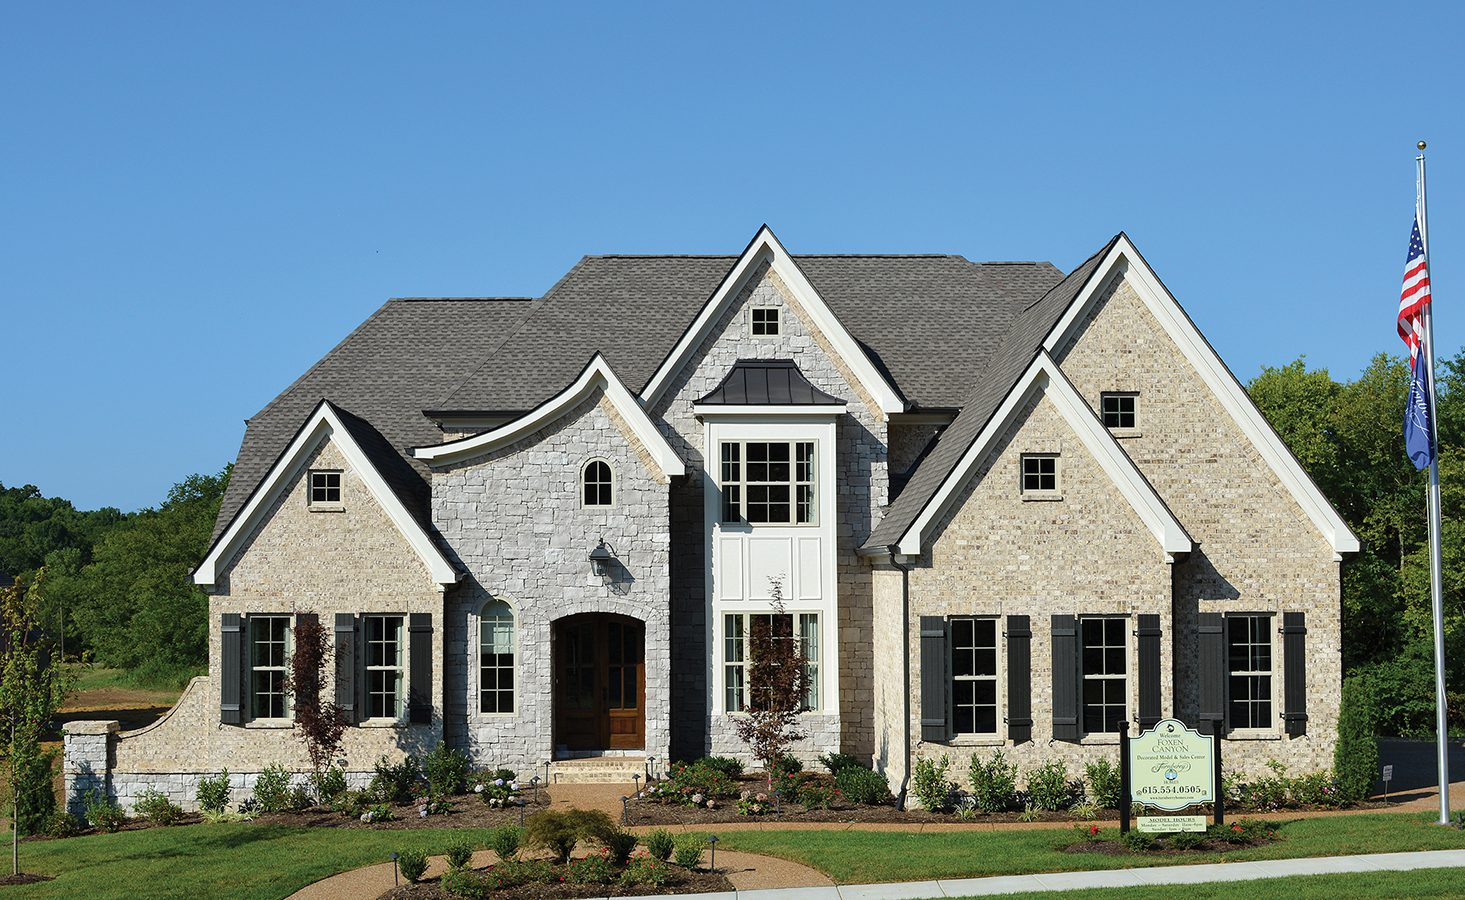 Westchester B - Premier, High-end home builders for luxury homes - luxury home builder | Nashville, TN